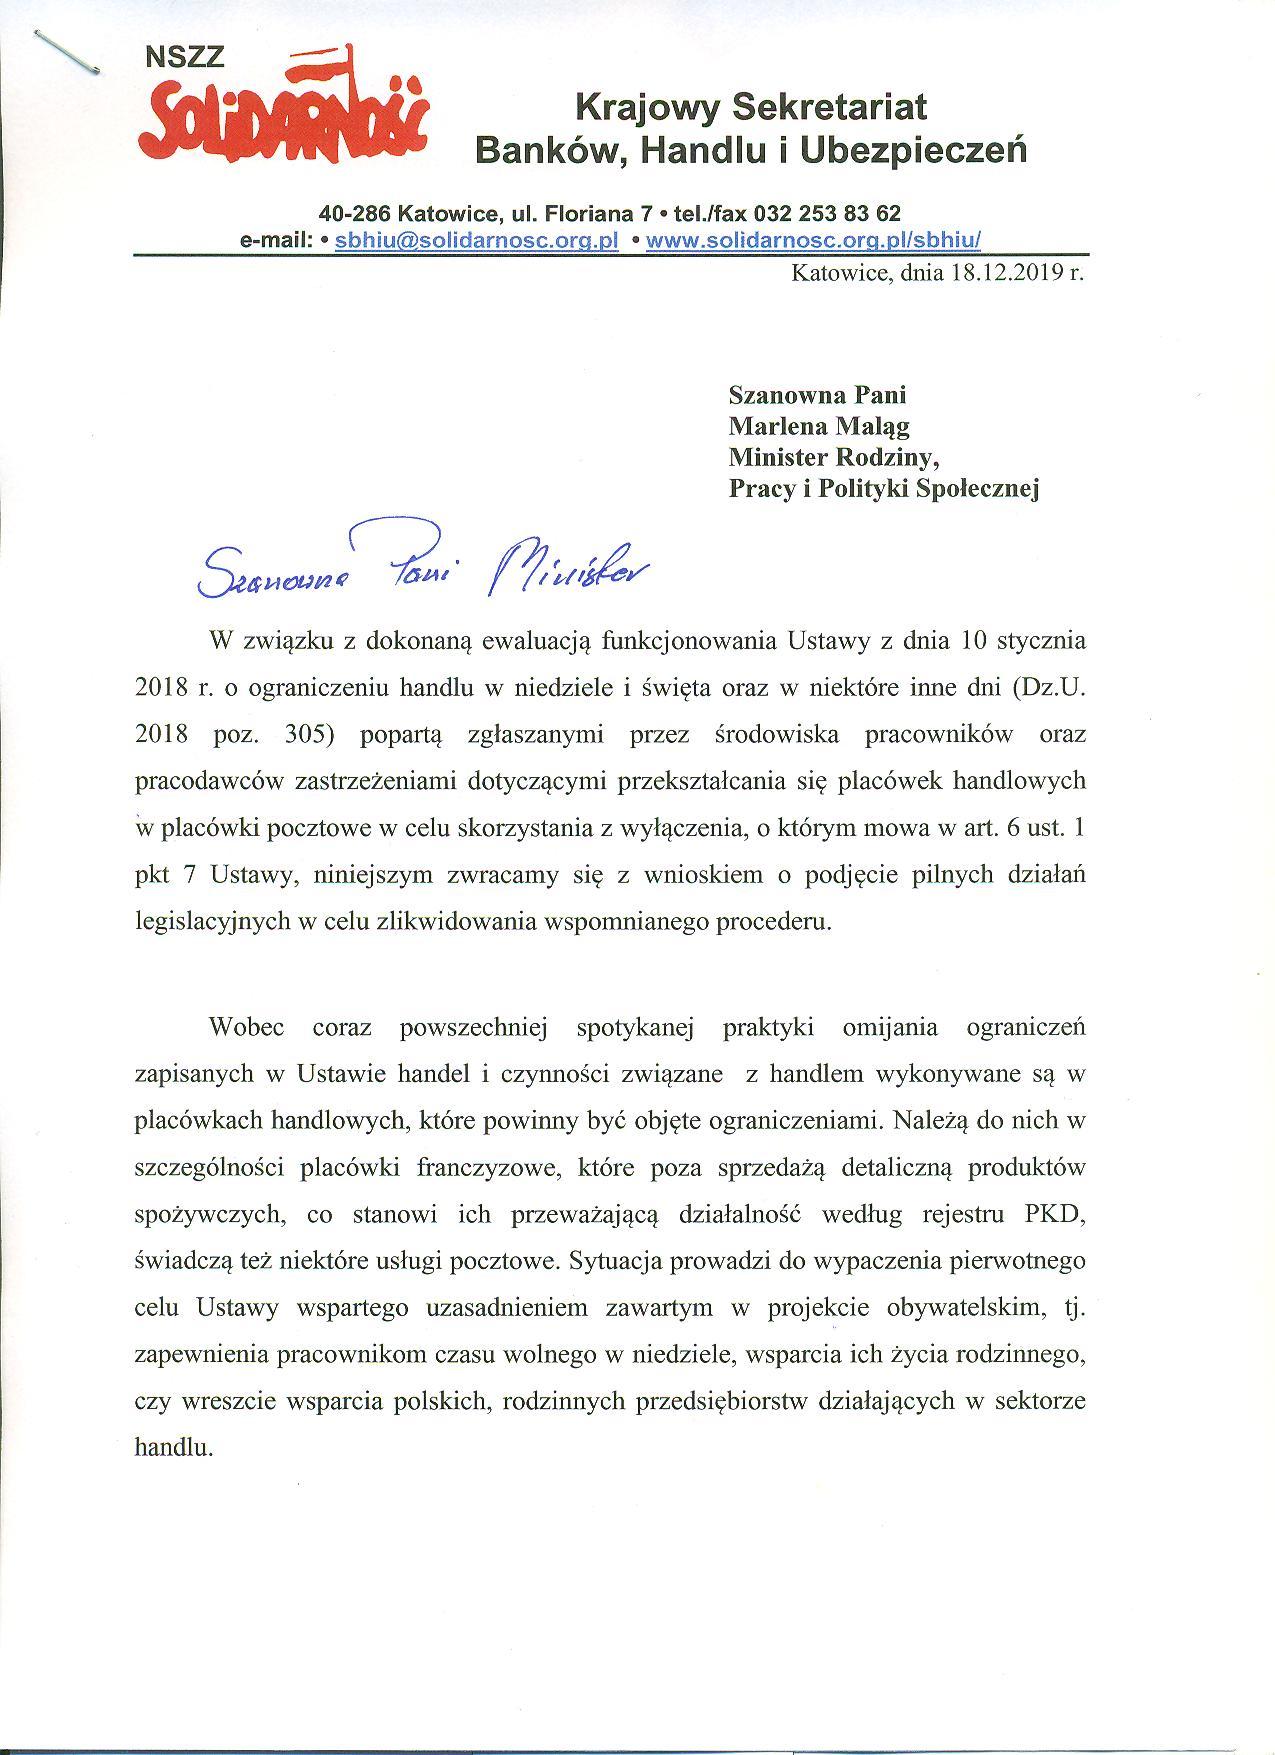 List do Pani MInister Maląg 1